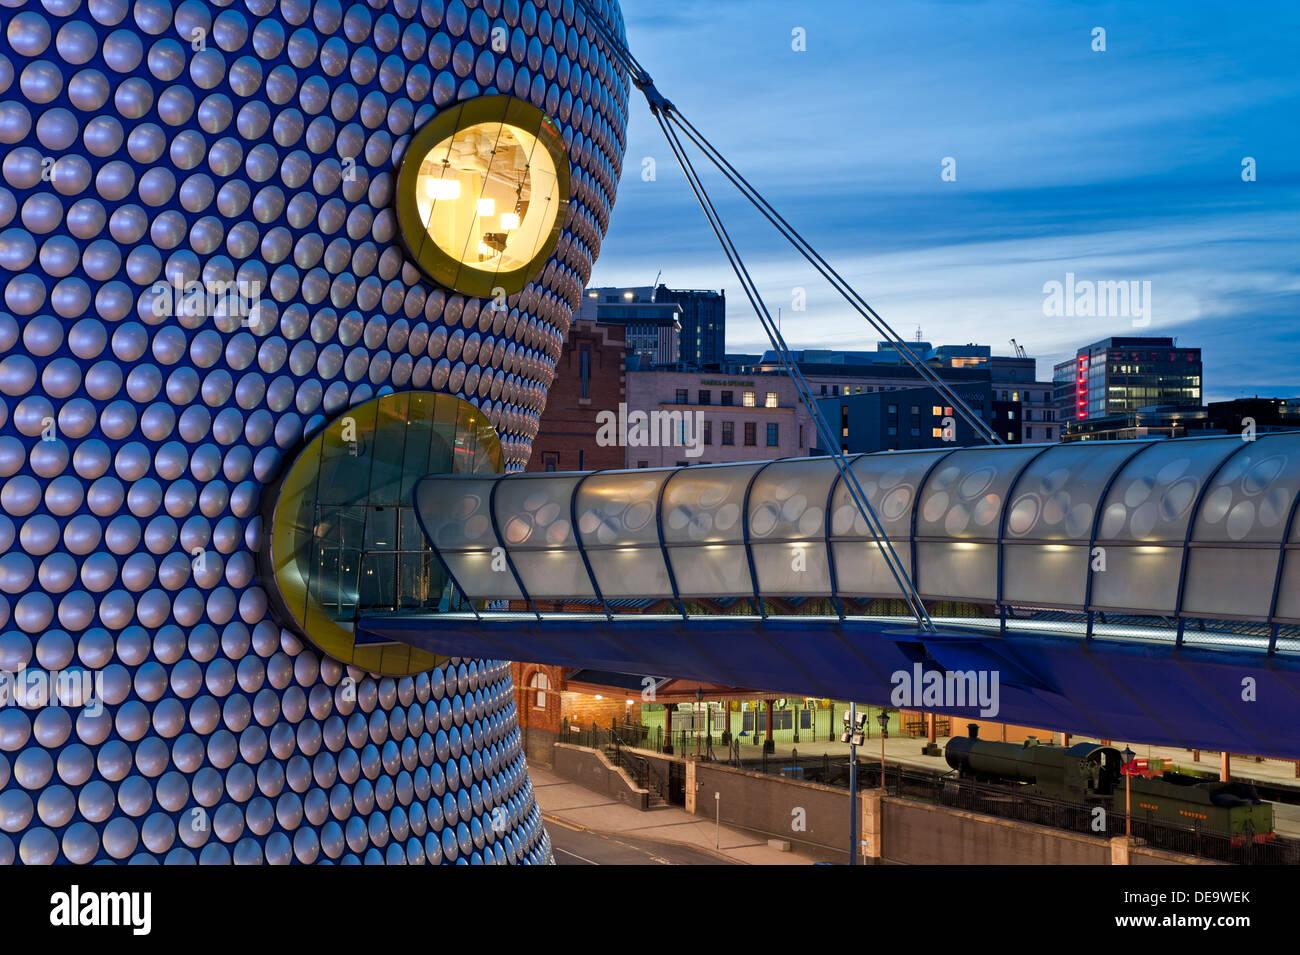 Selfridge's Department Store at Night, The Bull Ring, Birmingham City Centre, Birmingham, West Midlands, England, UK - Stock Image